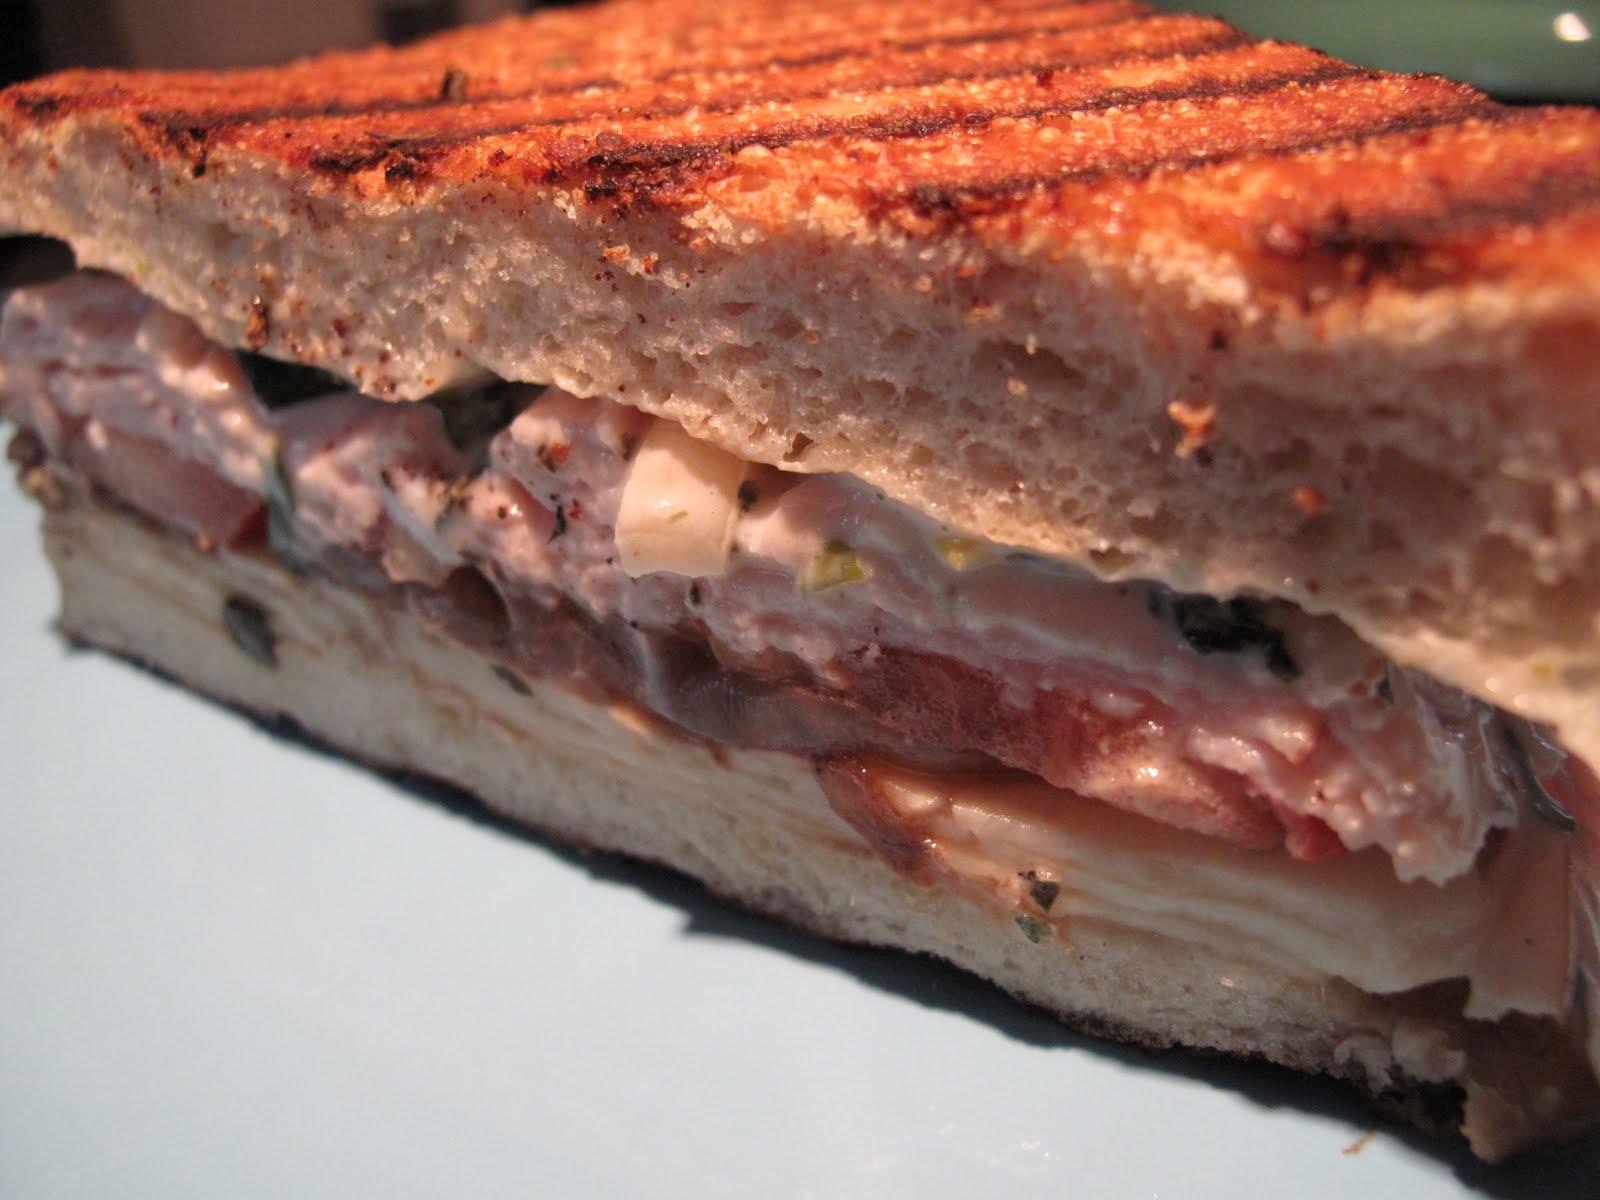 House Blend: Tuesday's Sandwich - Turkey Artichoke Panini